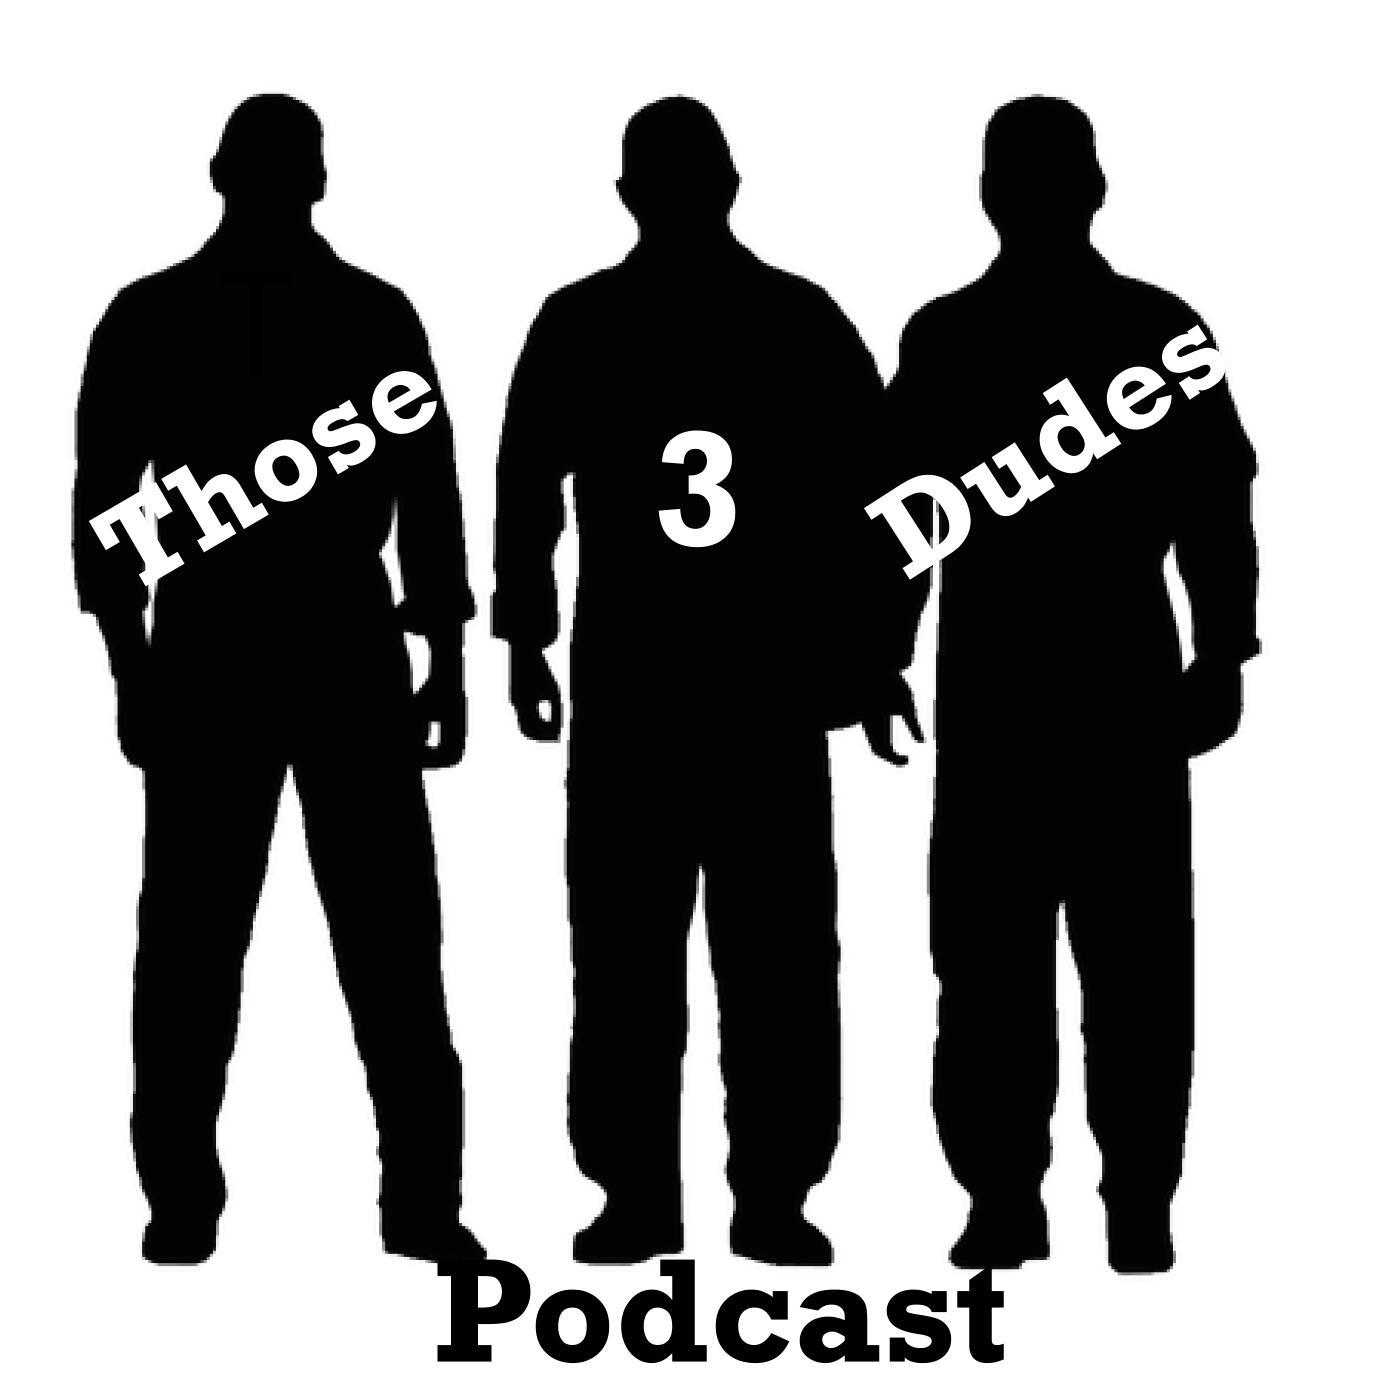 Those 3 Dudes Podcast